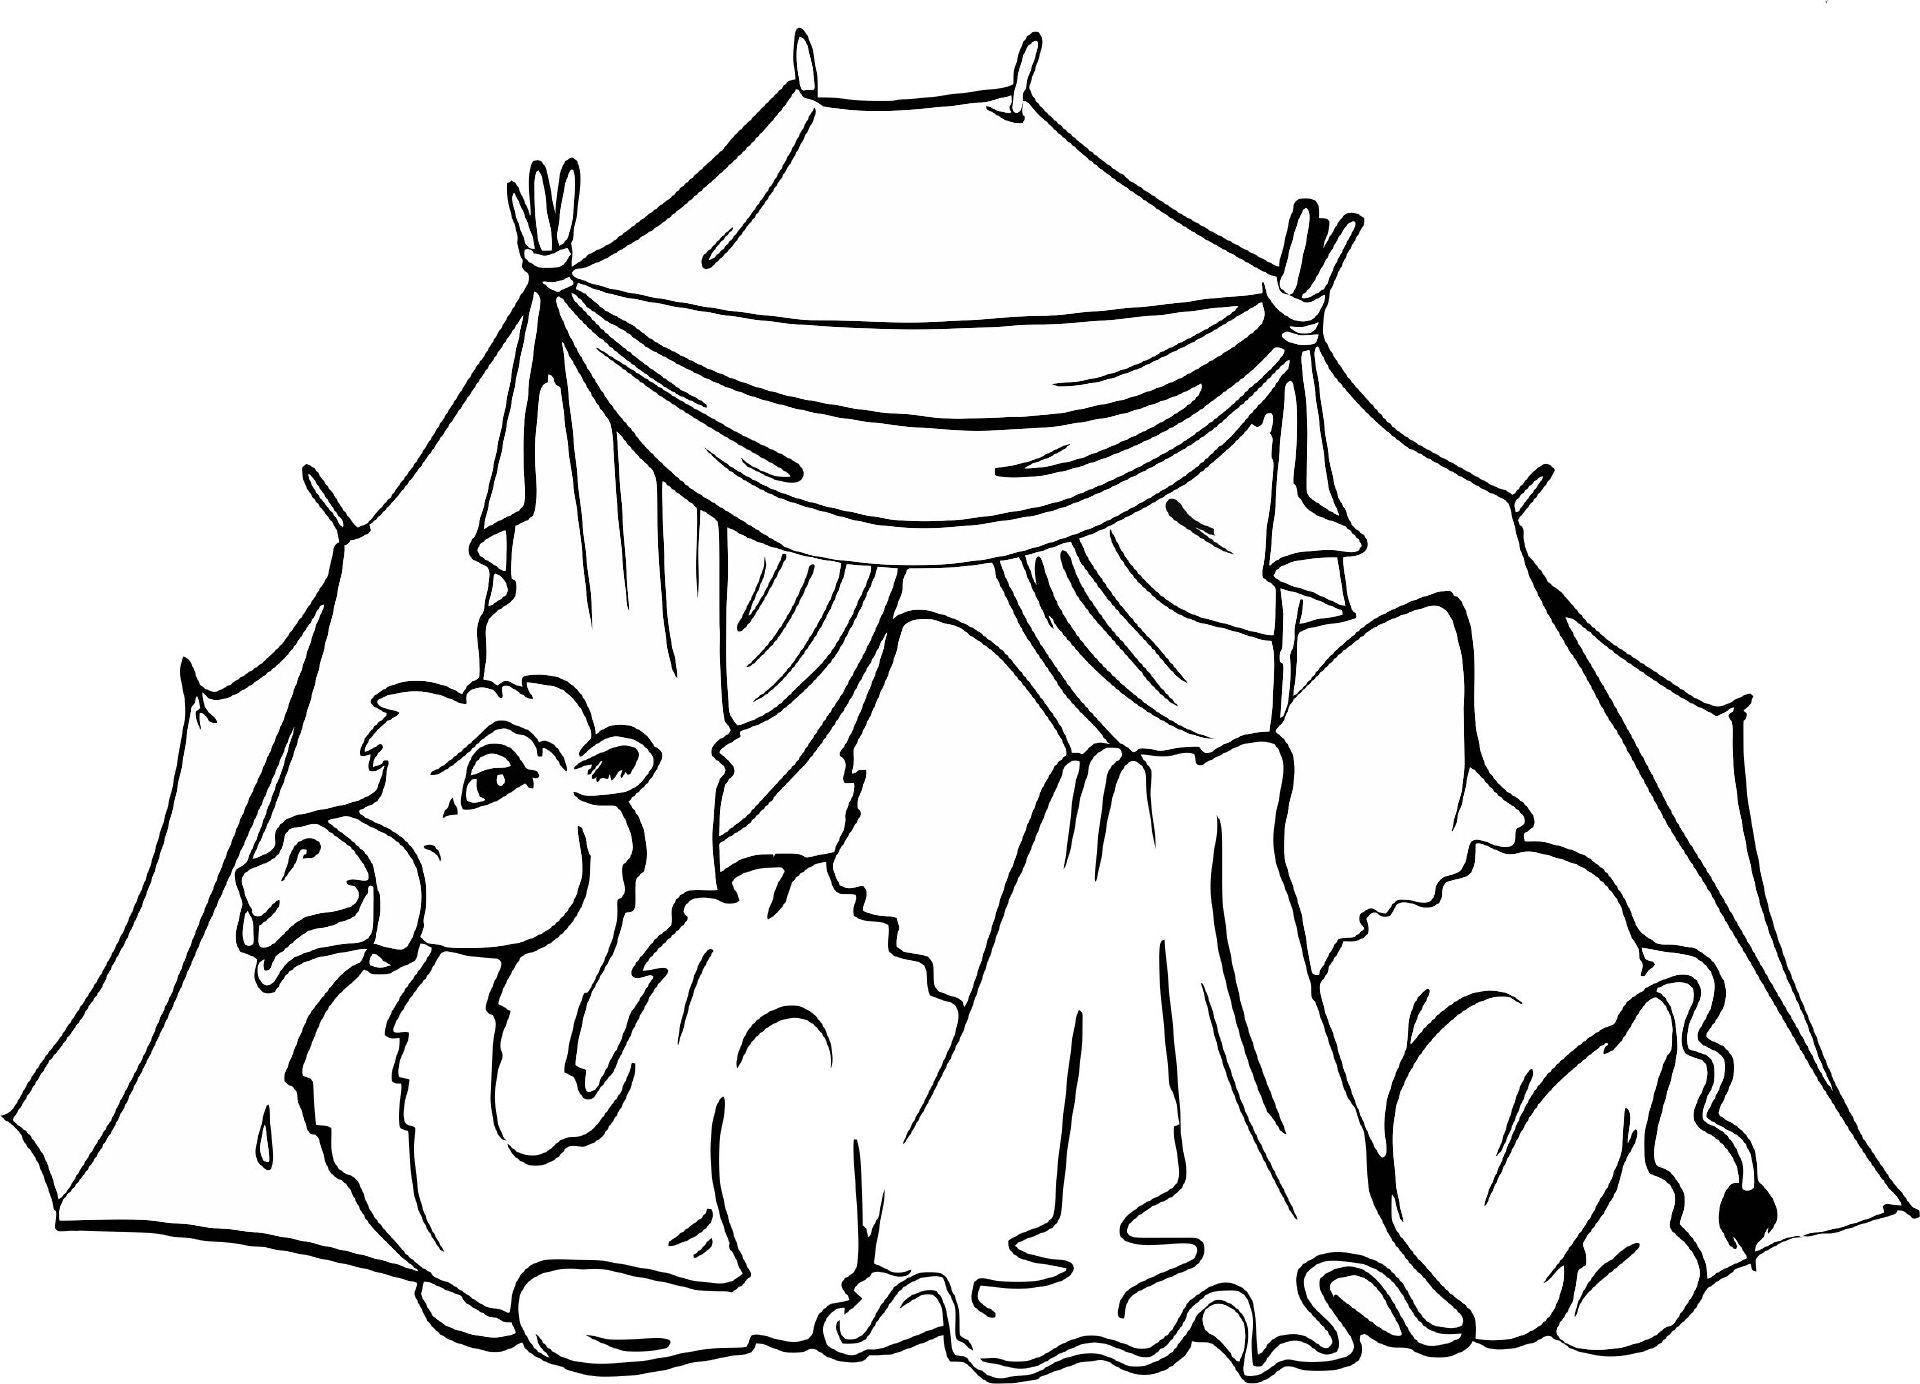 Kamel Vor Zelt Ausmalbilder Biblisch Pinterest Kamel